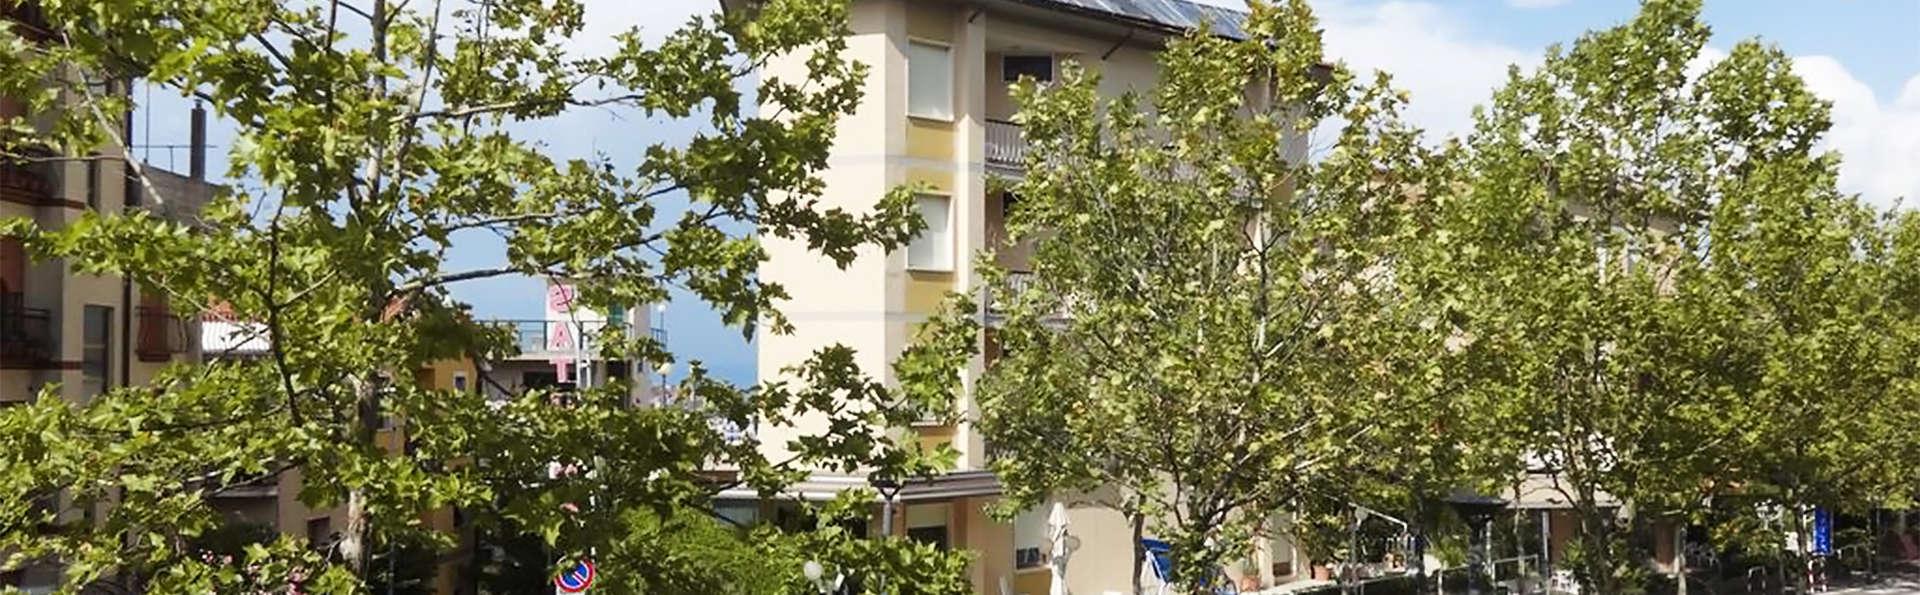 Hotel Saturno - EDIT_ext1.jpg